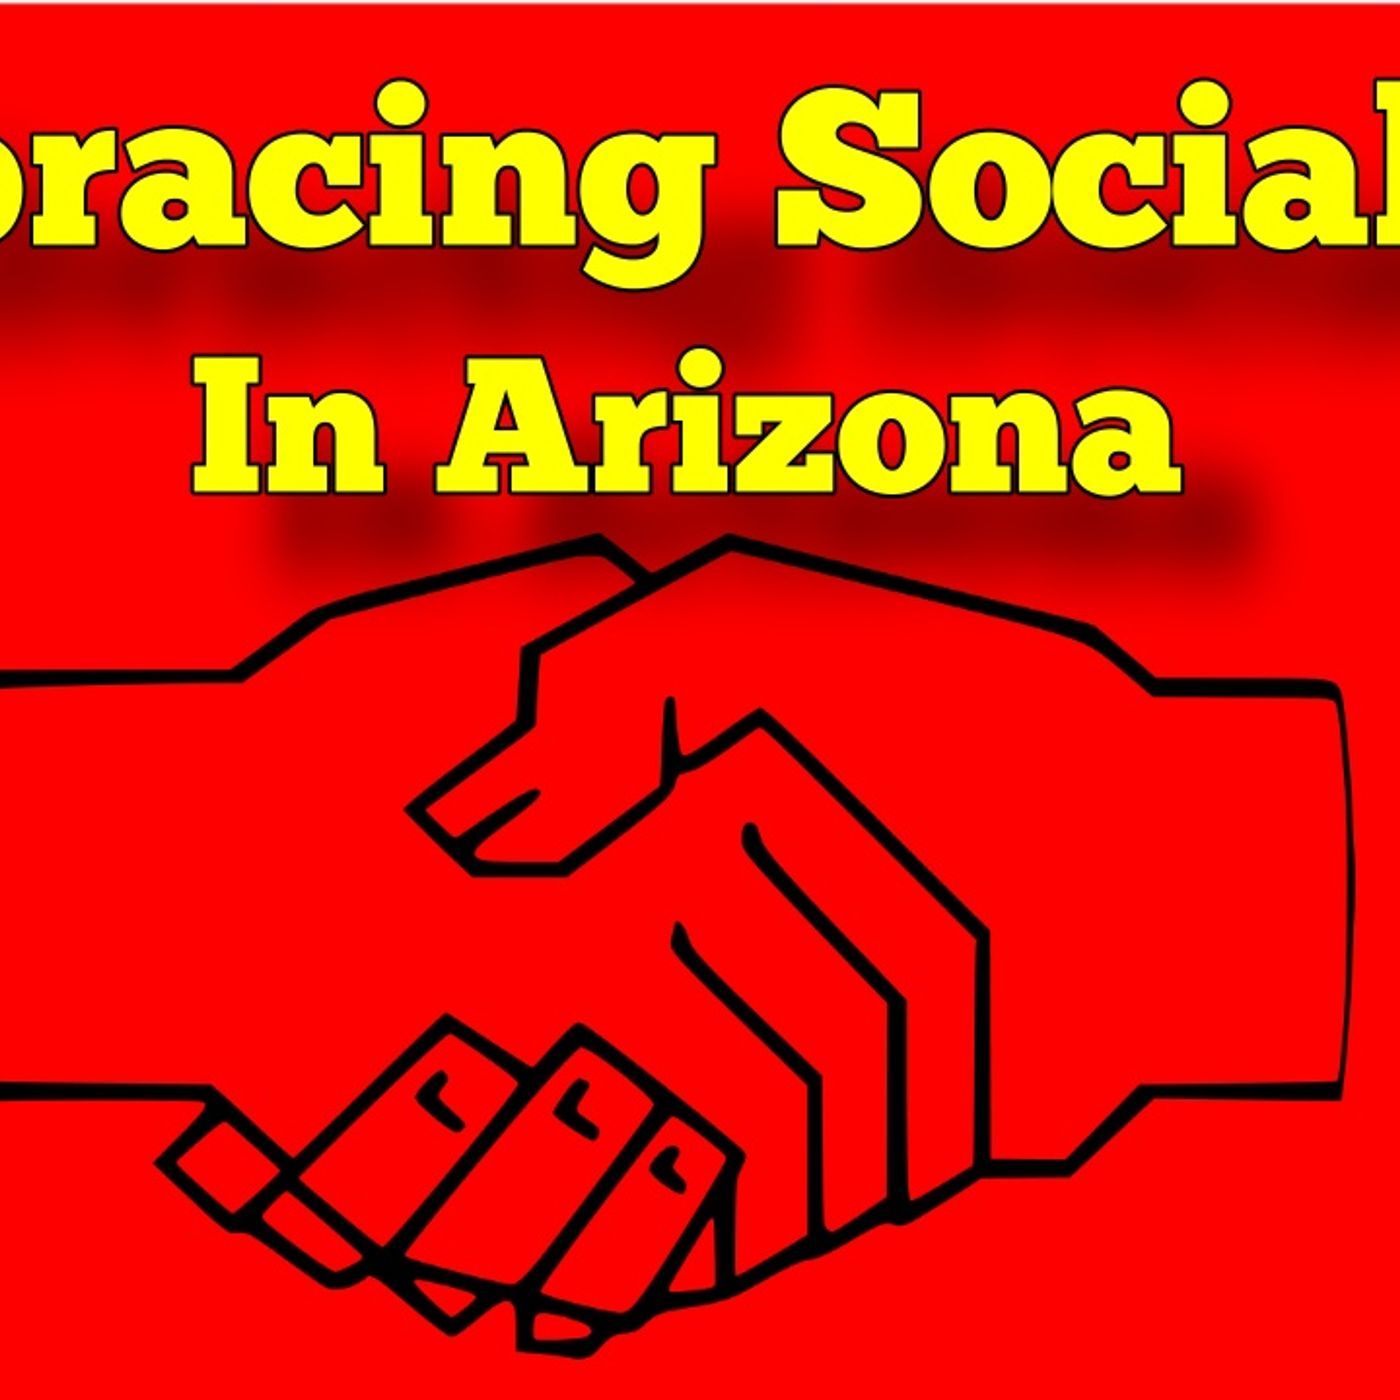 Embracing Socialism In Arizona, How To Make It Work, Arizona Talk Radio 67